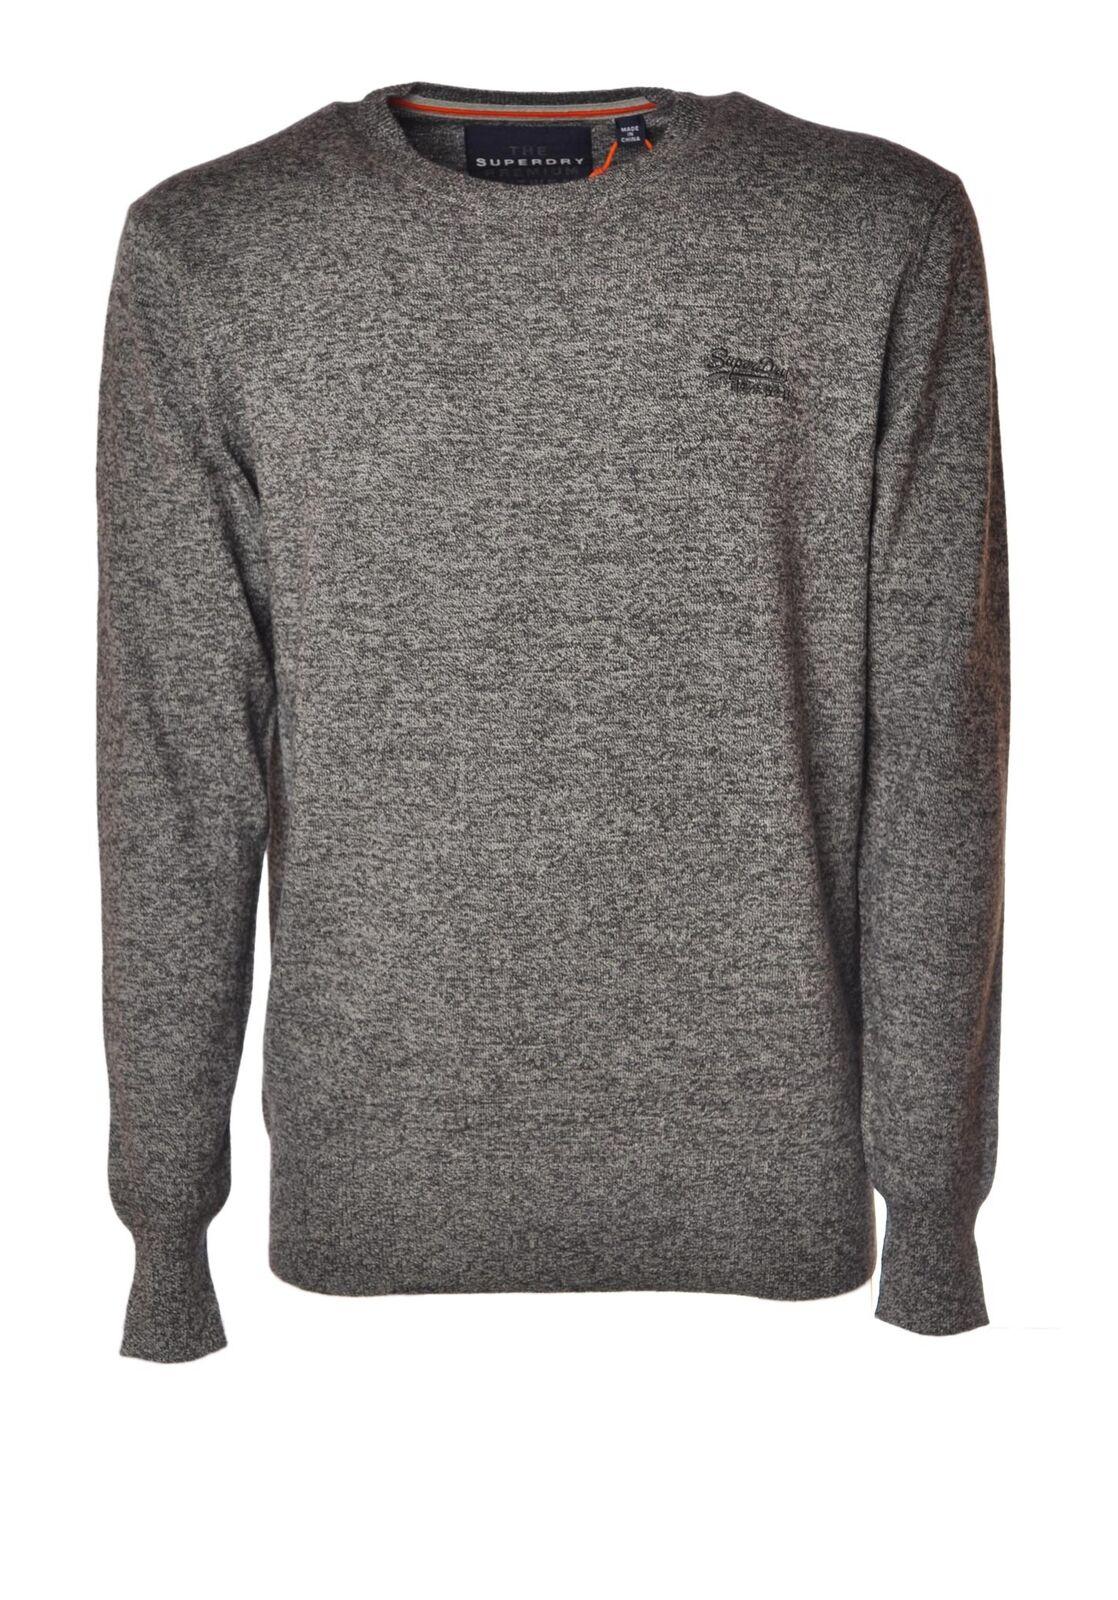 Superdry  -  Sweaters - Male - Grau - 4338201B181856